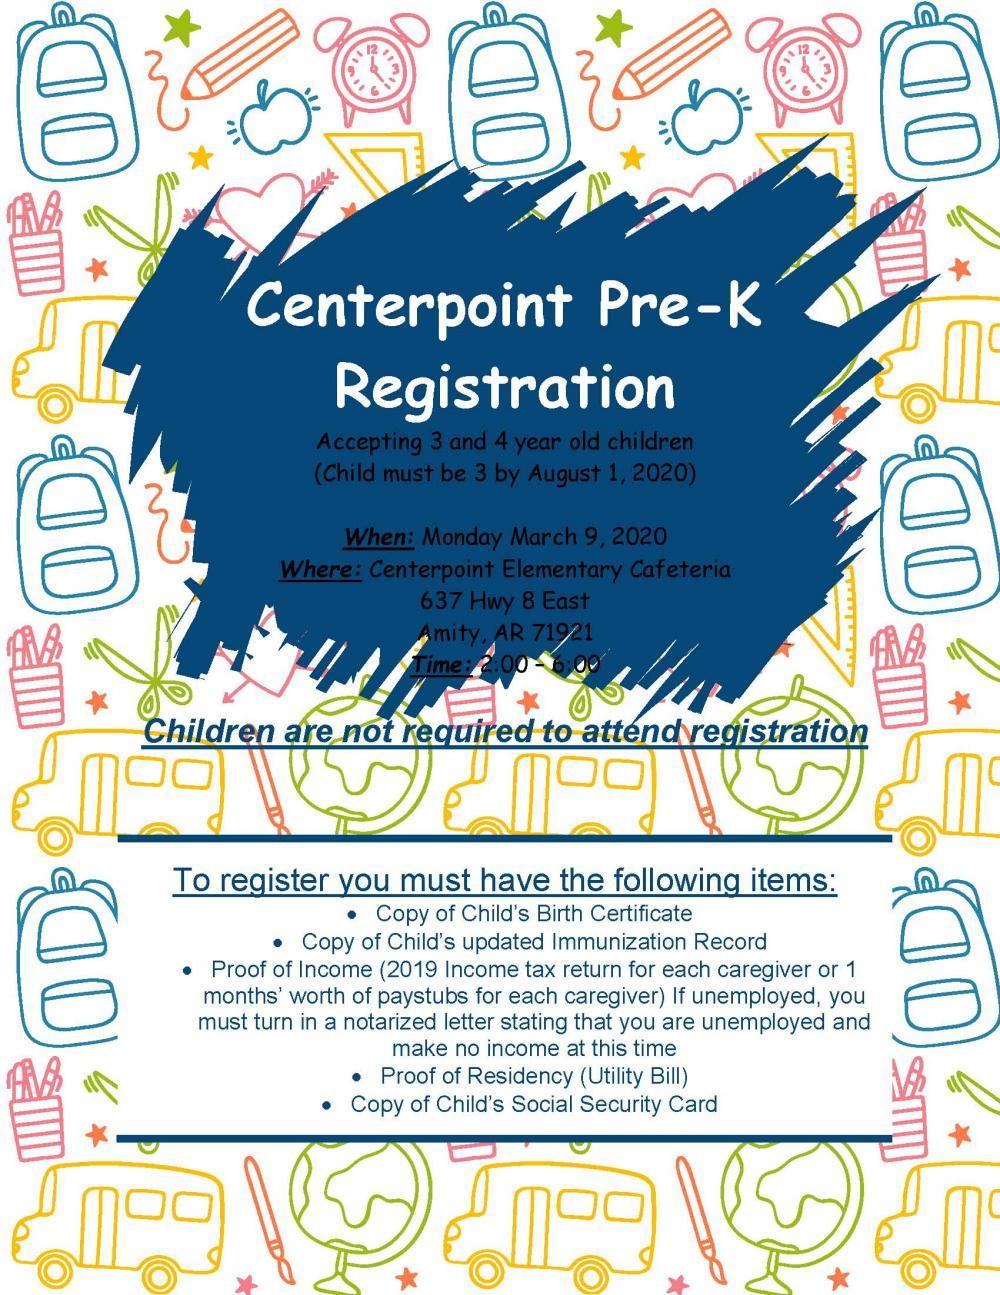 Centerpoint Pre-K Registration Flyer